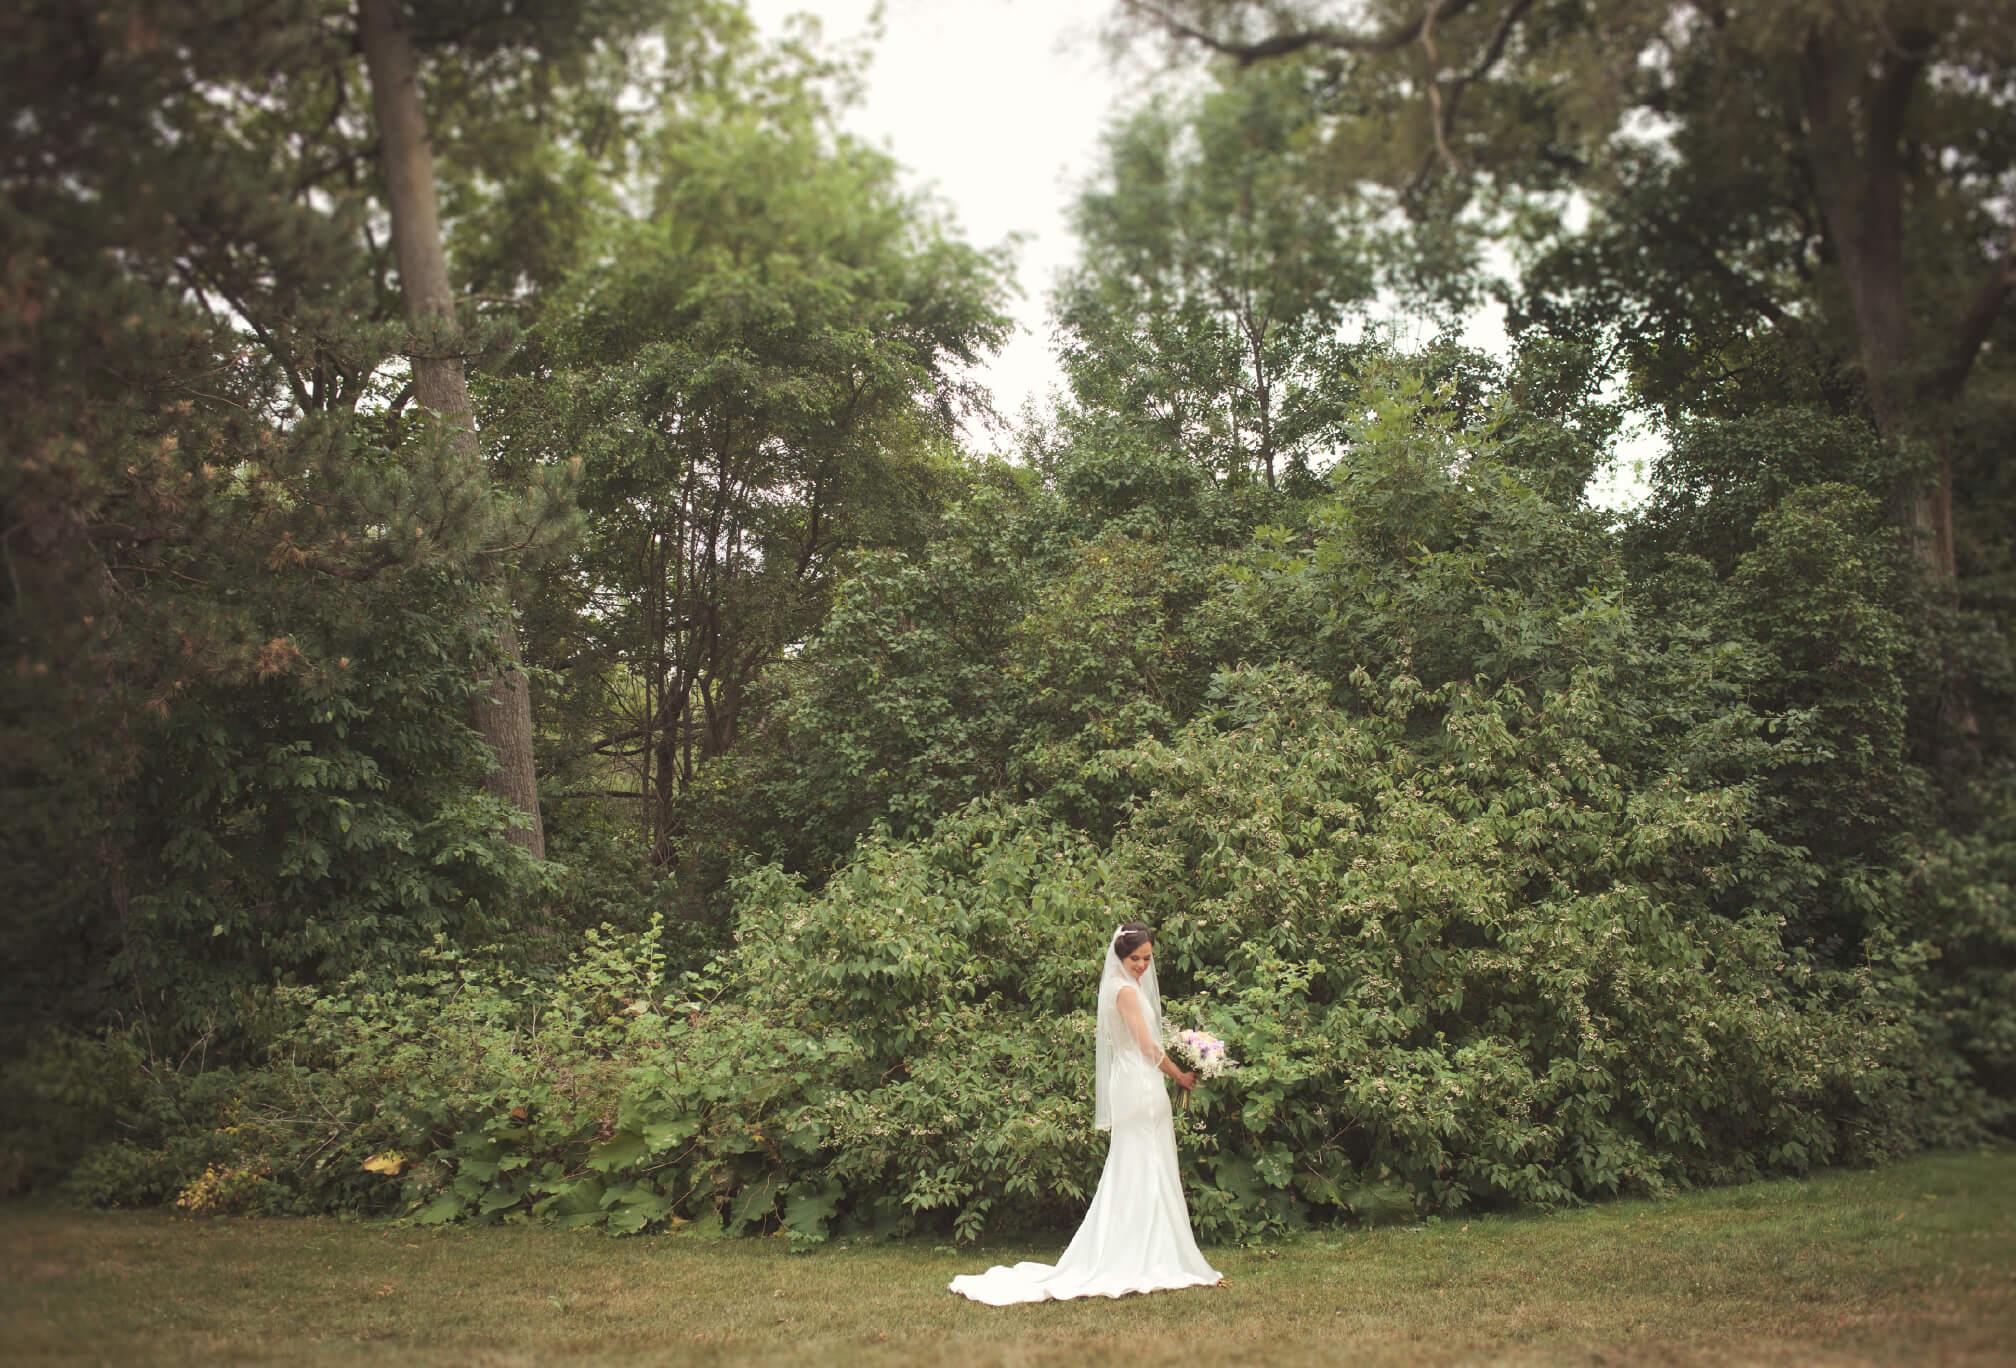 big forest background bride